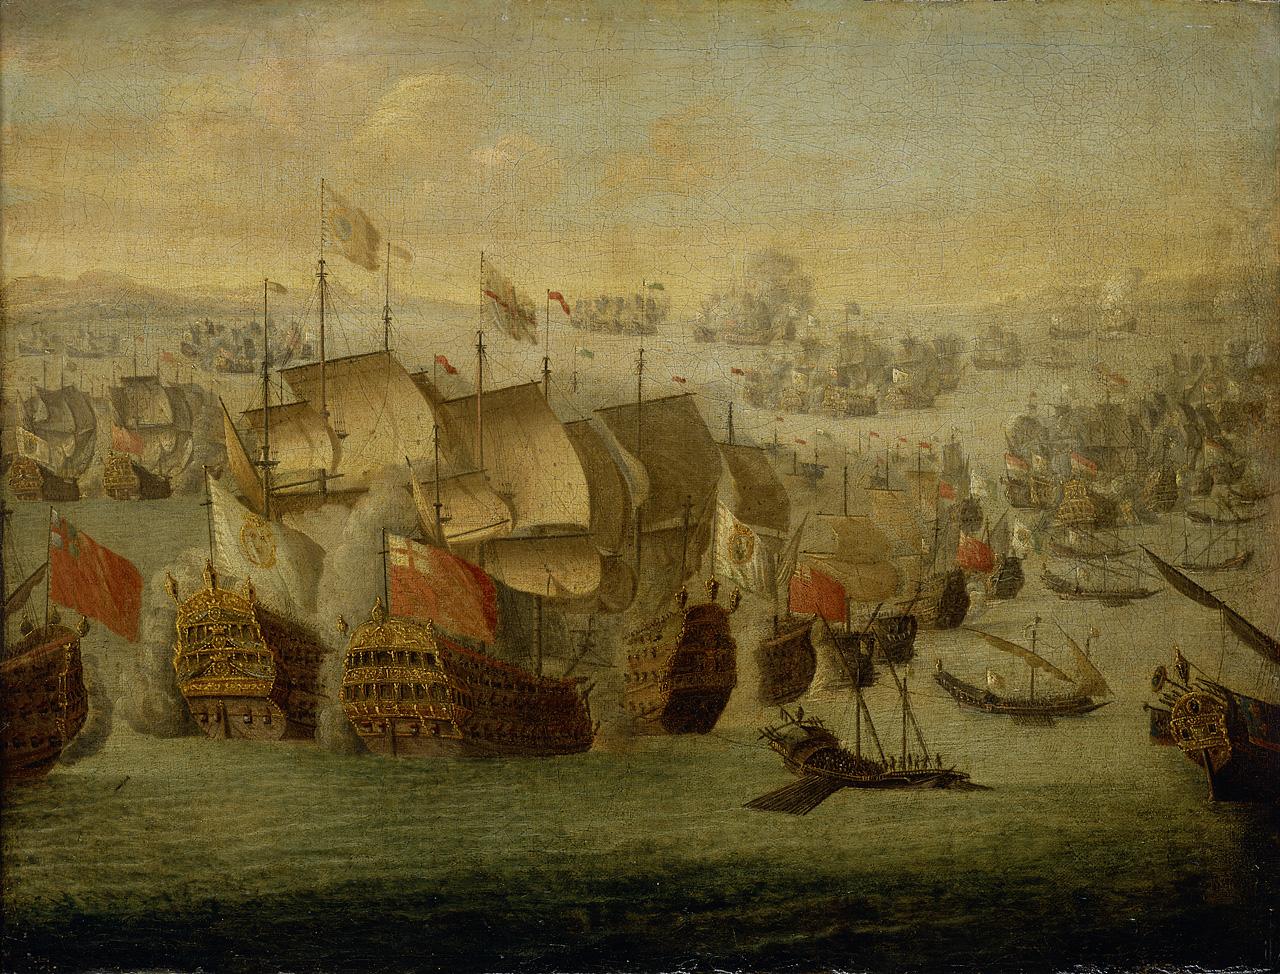 Blas de Lezo y Olavarrieta (1689-1741): un gran estratega del siglo XVIII Battle_of_Malaga%2C_1704